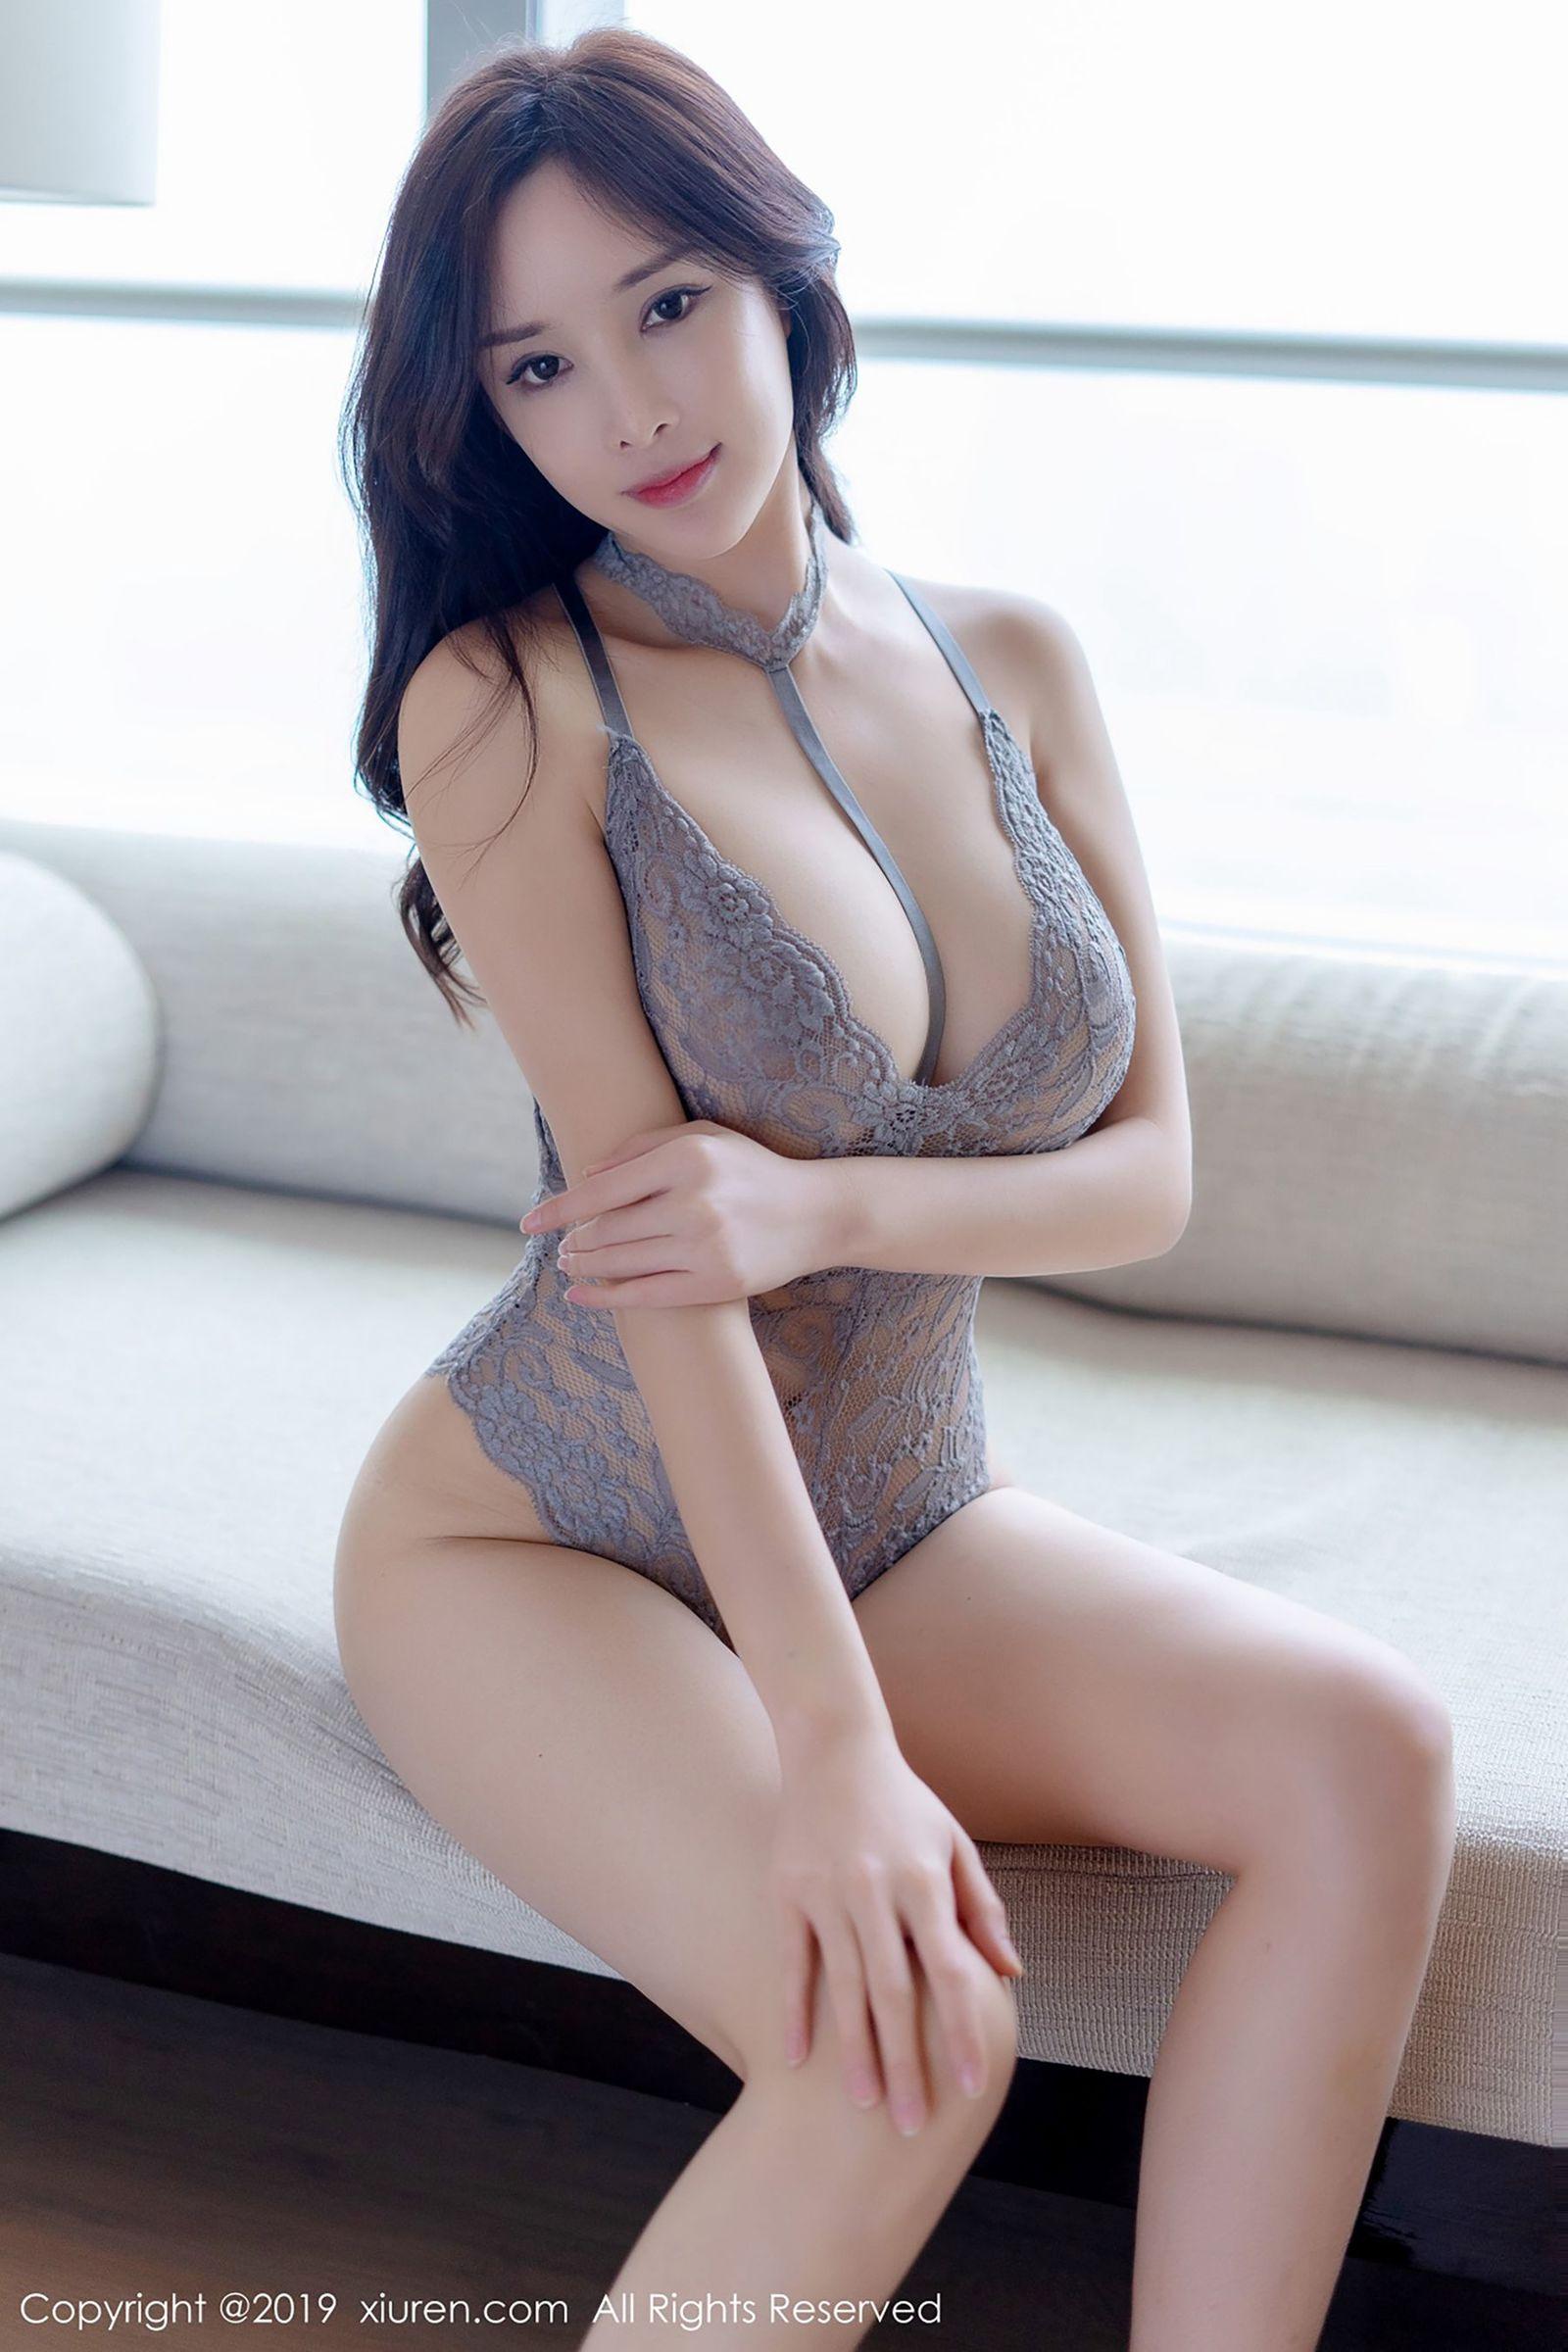 [XiuRen秀人] No.1314 性感女神@奶瓶土肥圆矮挫丑黑穷魅惑私房写真